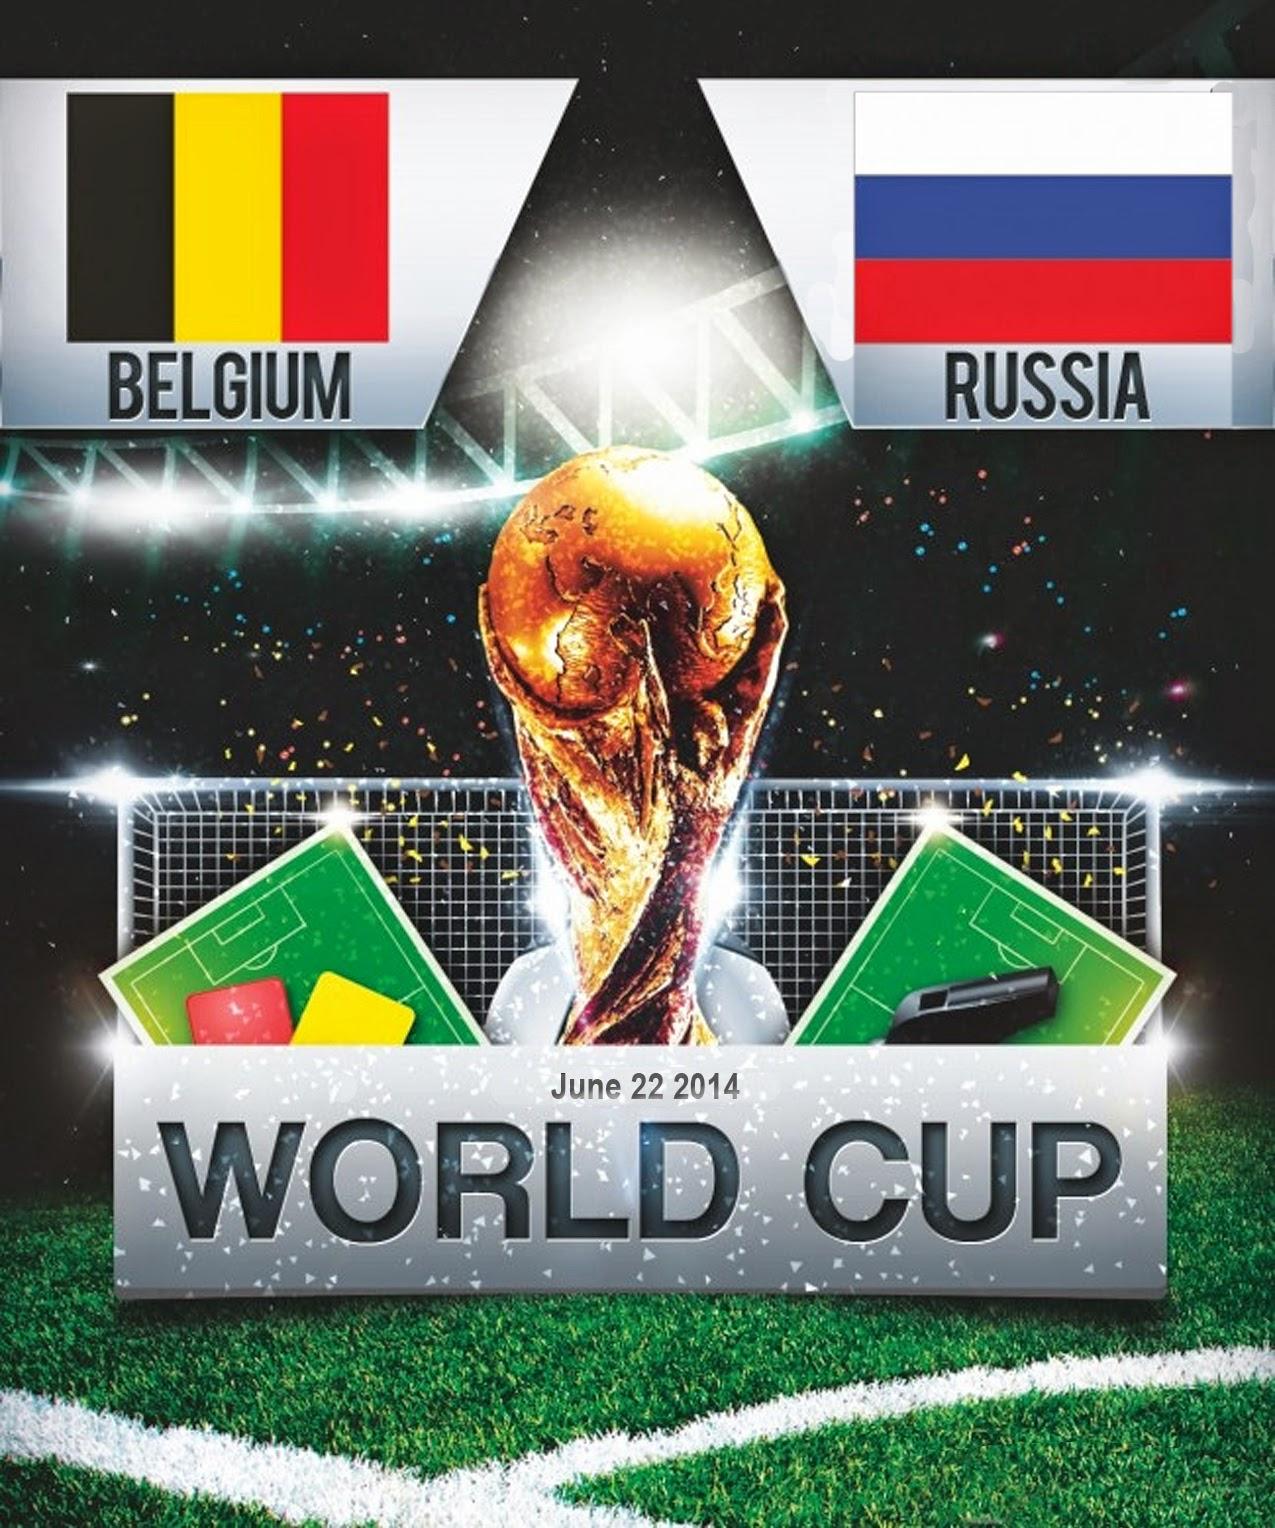 FIFA World Cup 2014 - Belgium vs Russia